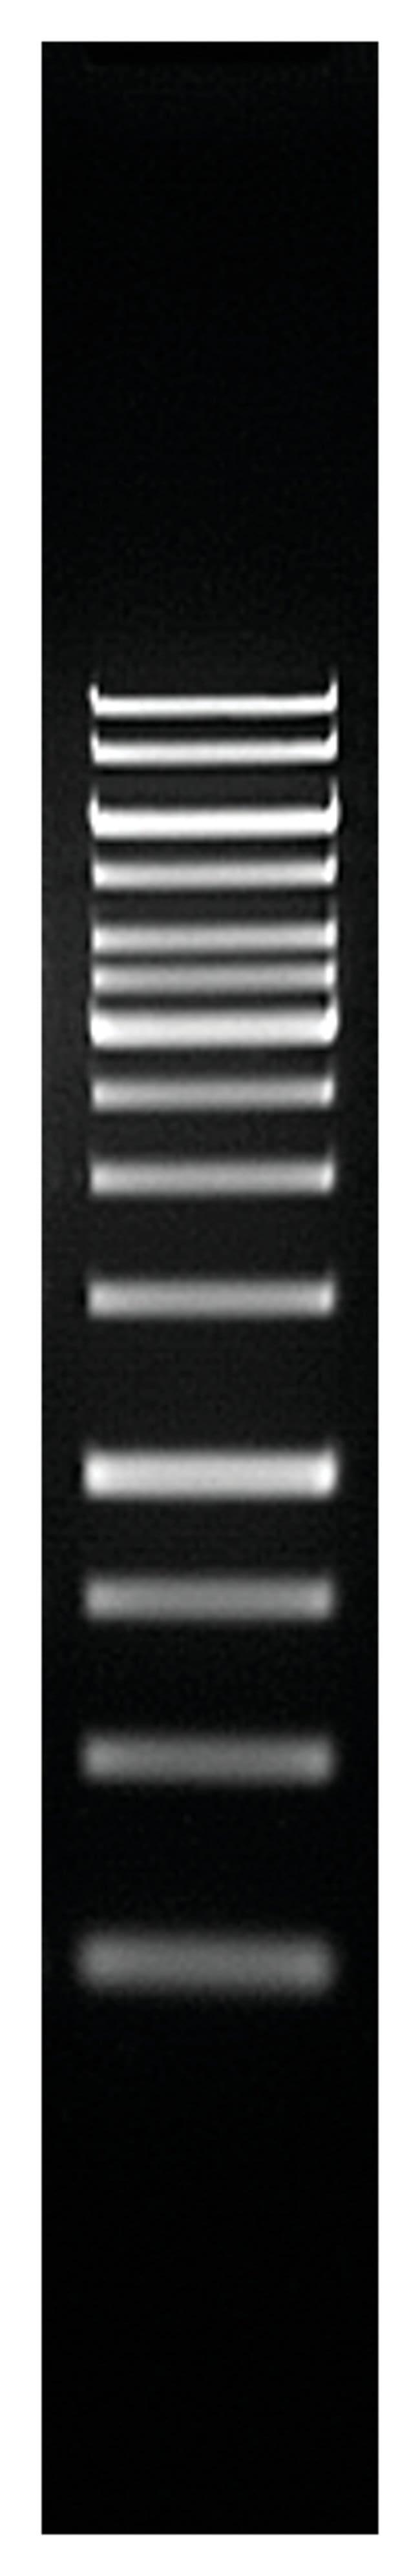 Thermo Scientific GeneRuler 1 kb DNA Ladder :Life Sciences:Biochemicals